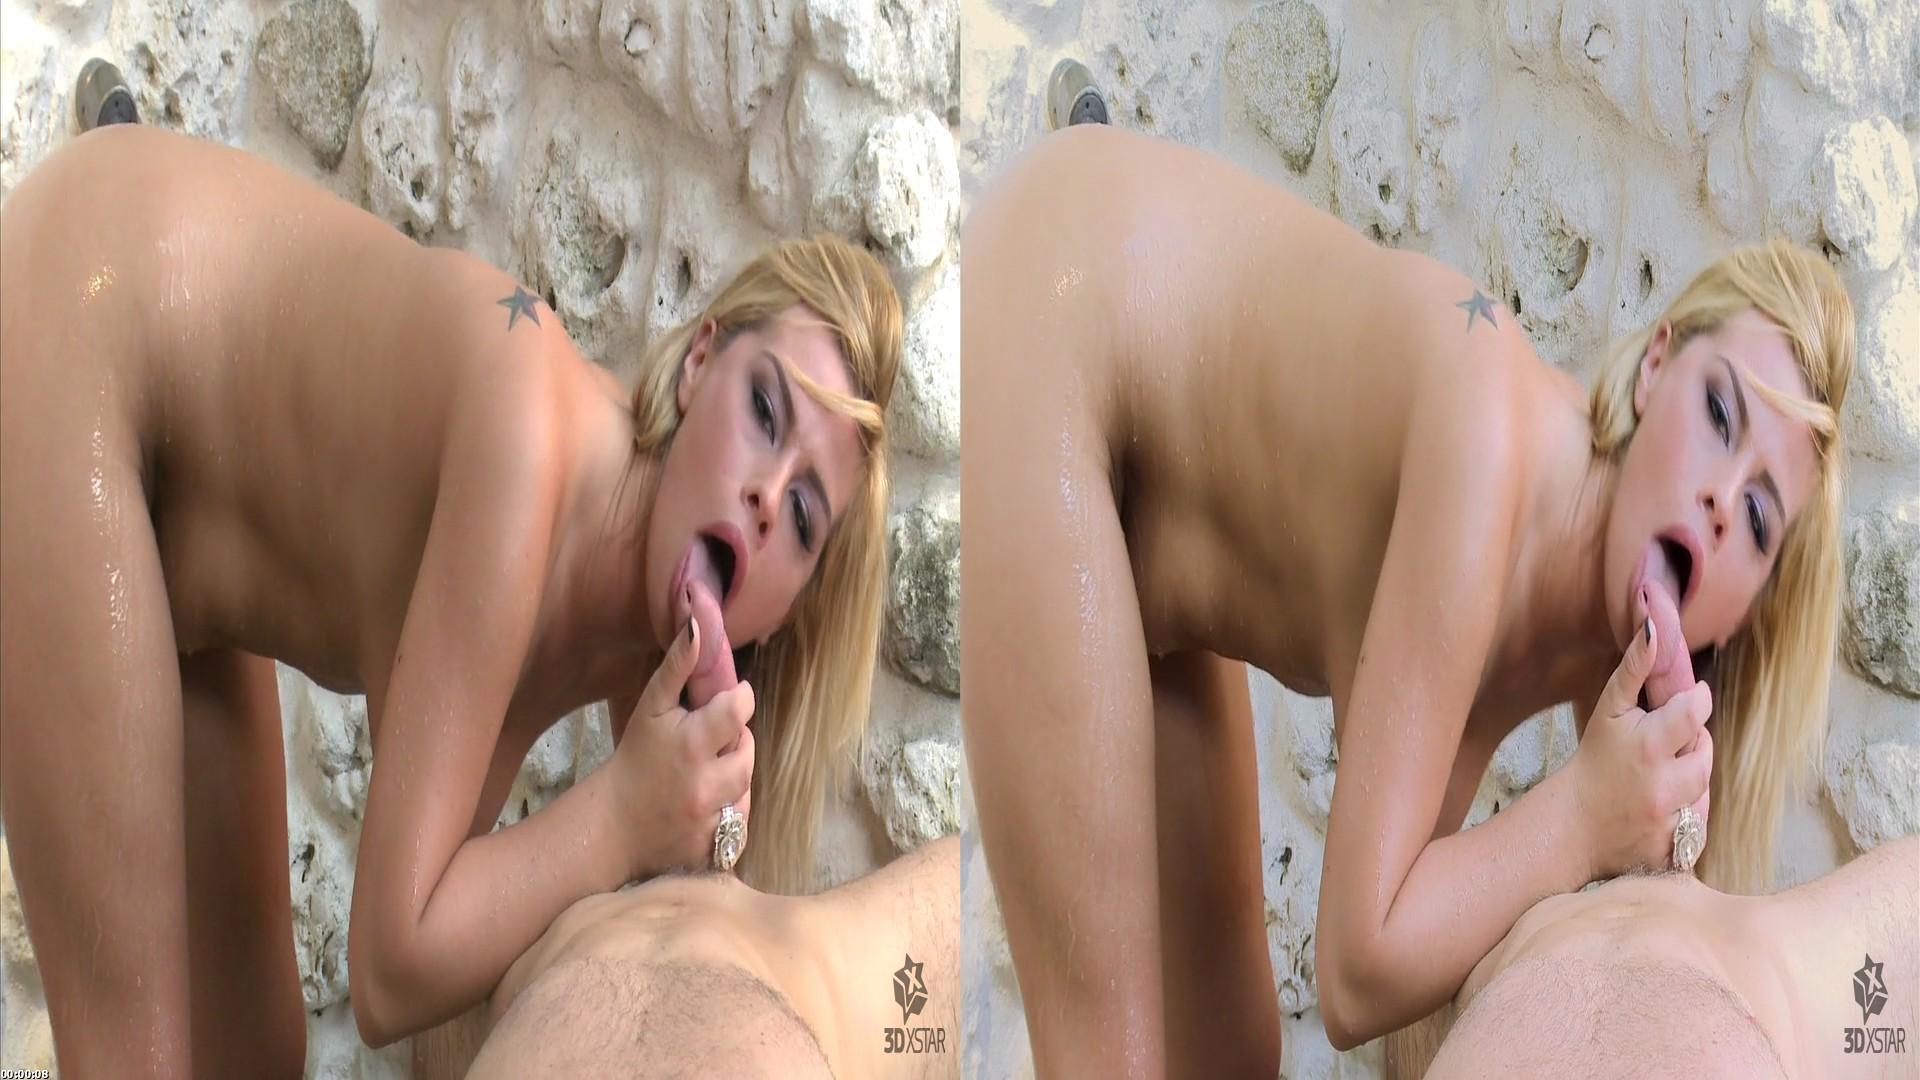 Elf pornstars sexy picture